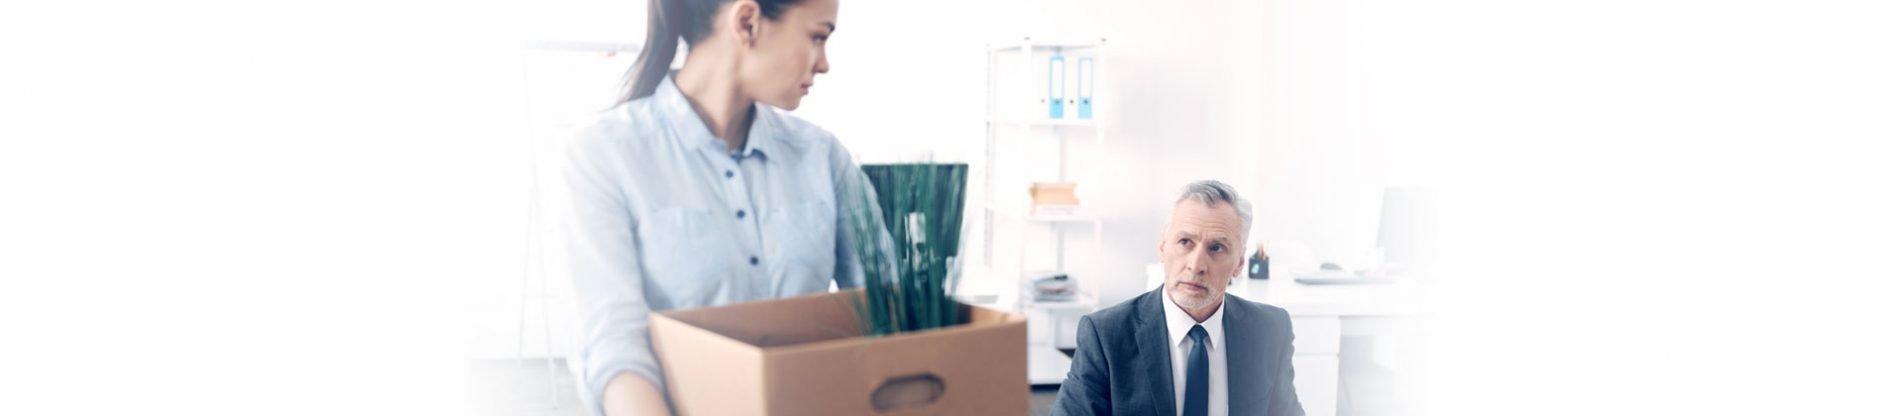 Employee-Dismissal